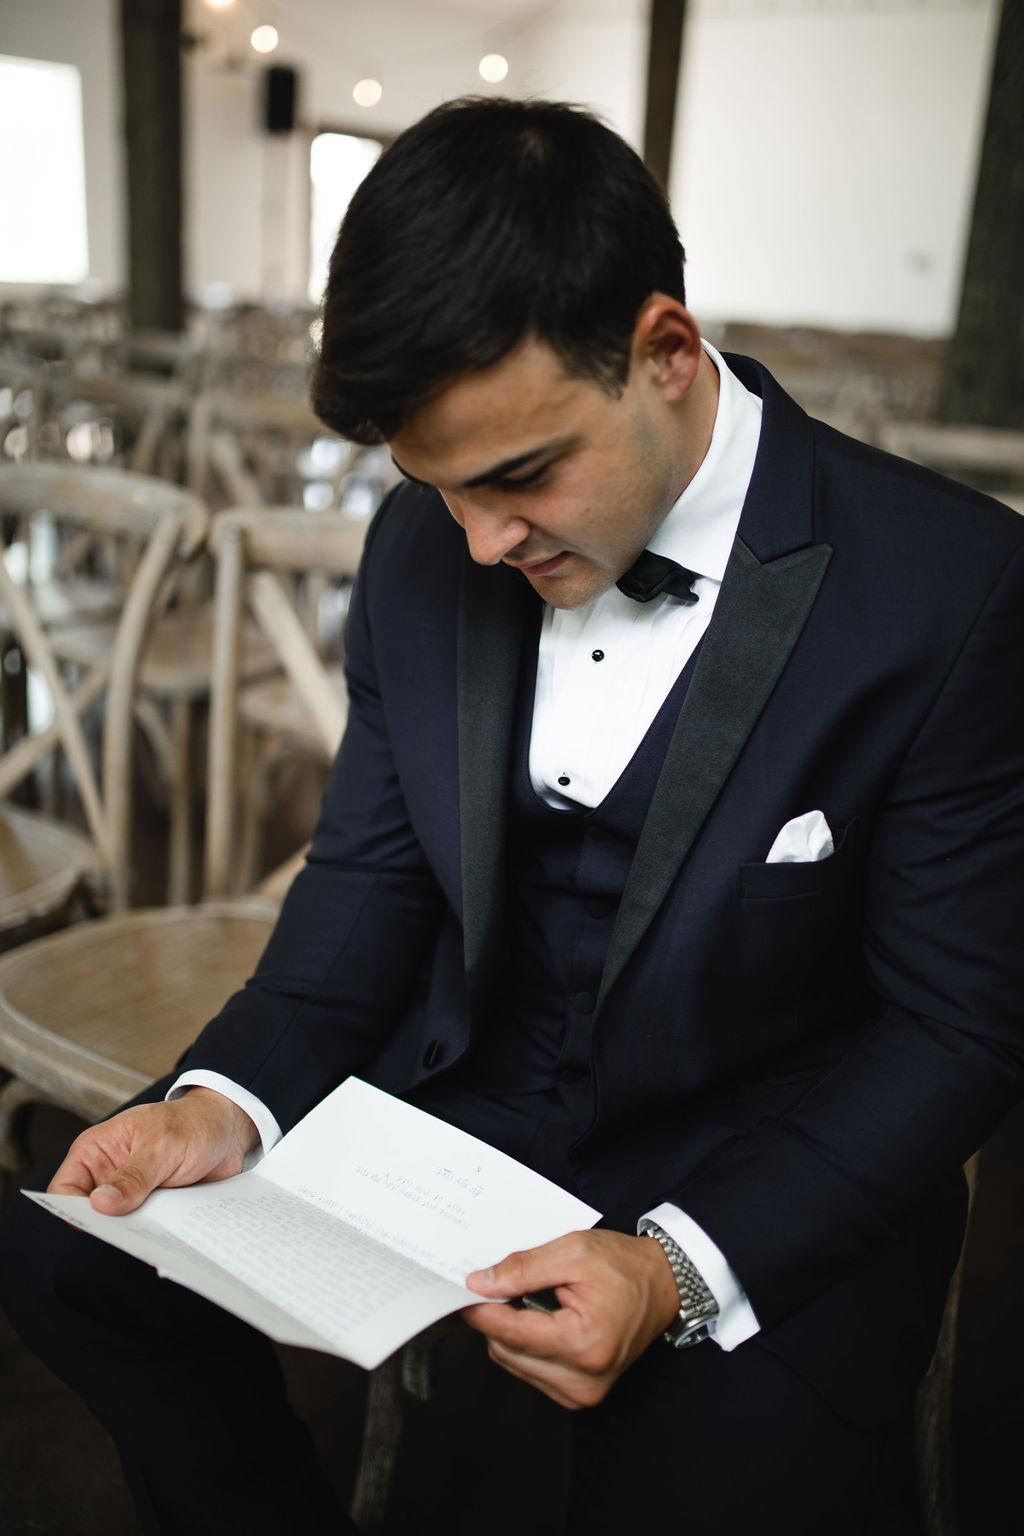 Modern grooms attire